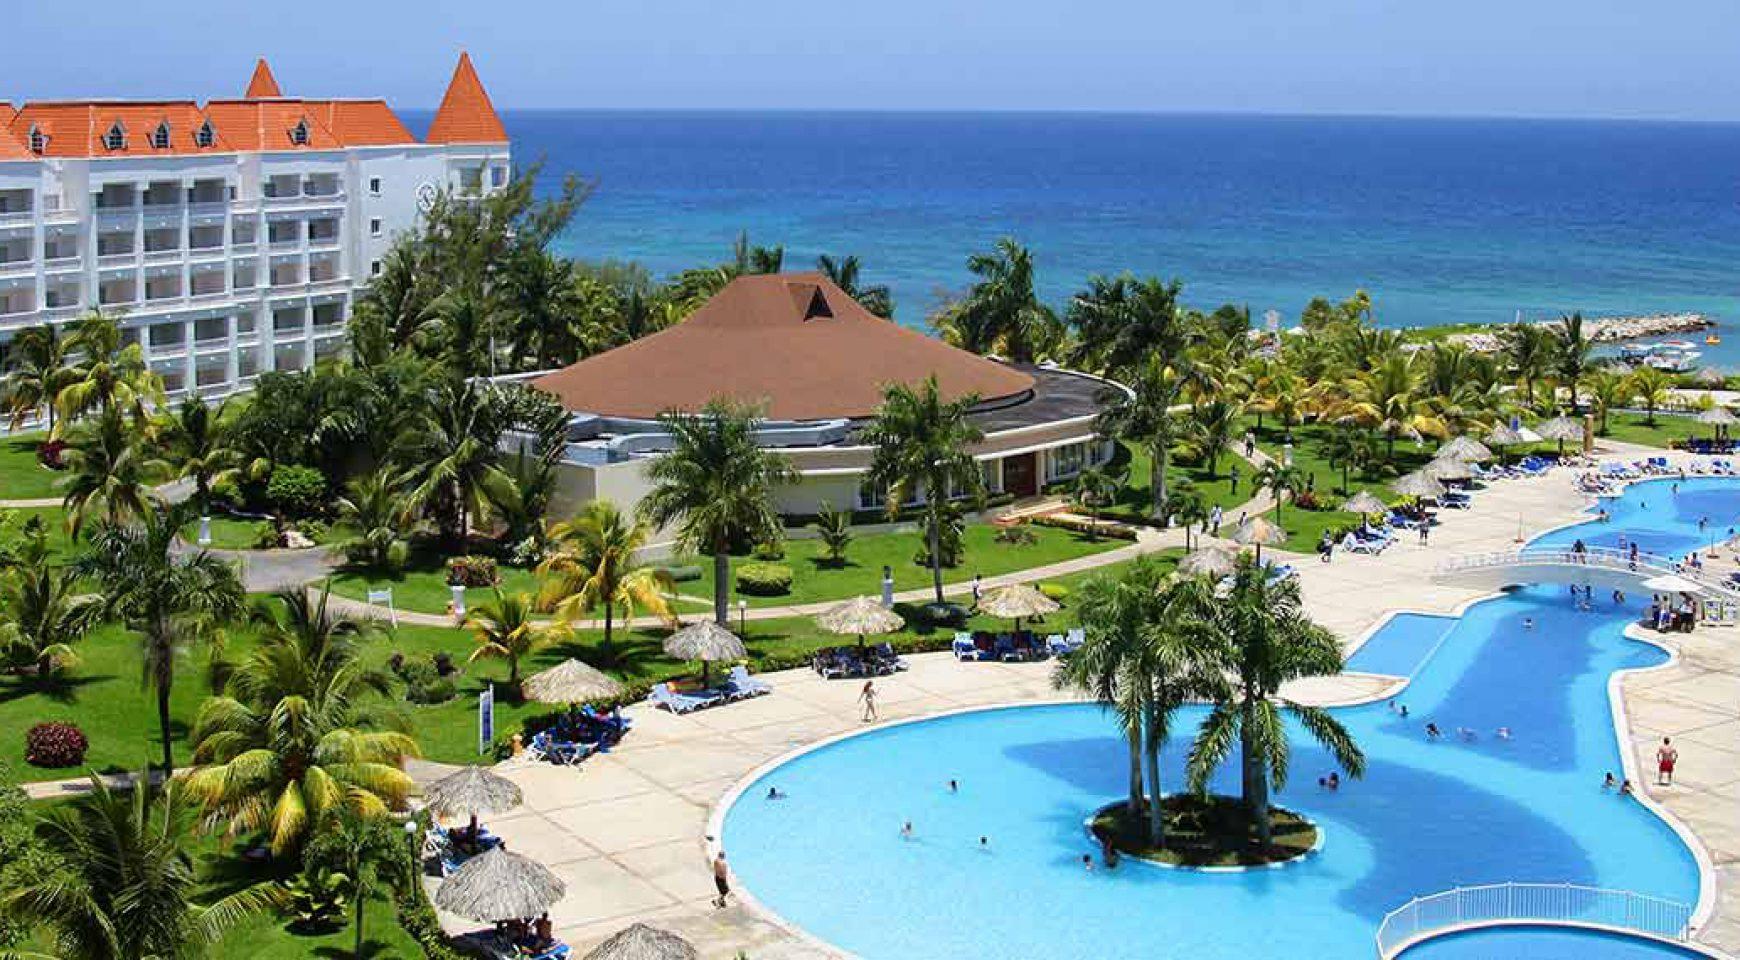 Grand Bahia Principe Jamaica All Inclusive Resort